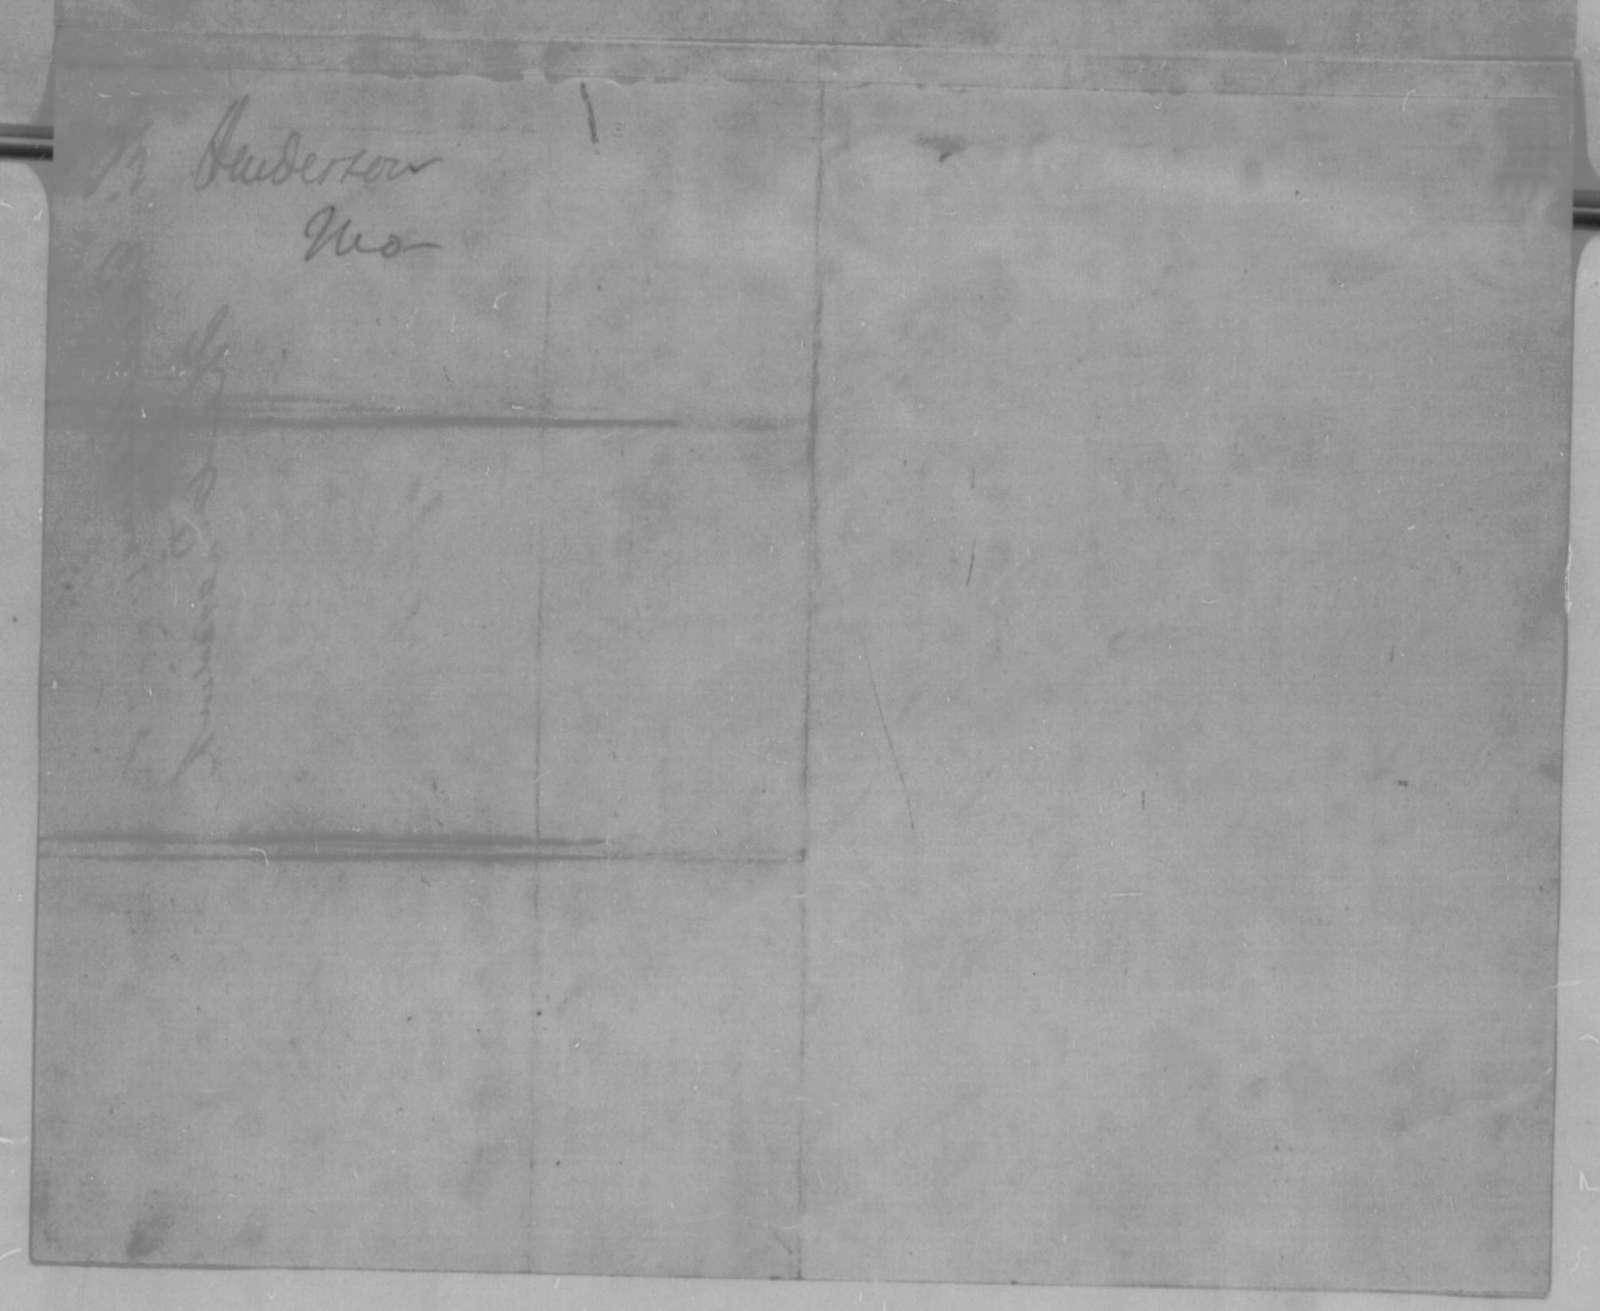 John B. Henderson to Abraham Lincoln, Sunday, December 20, 1863  (Introduction)